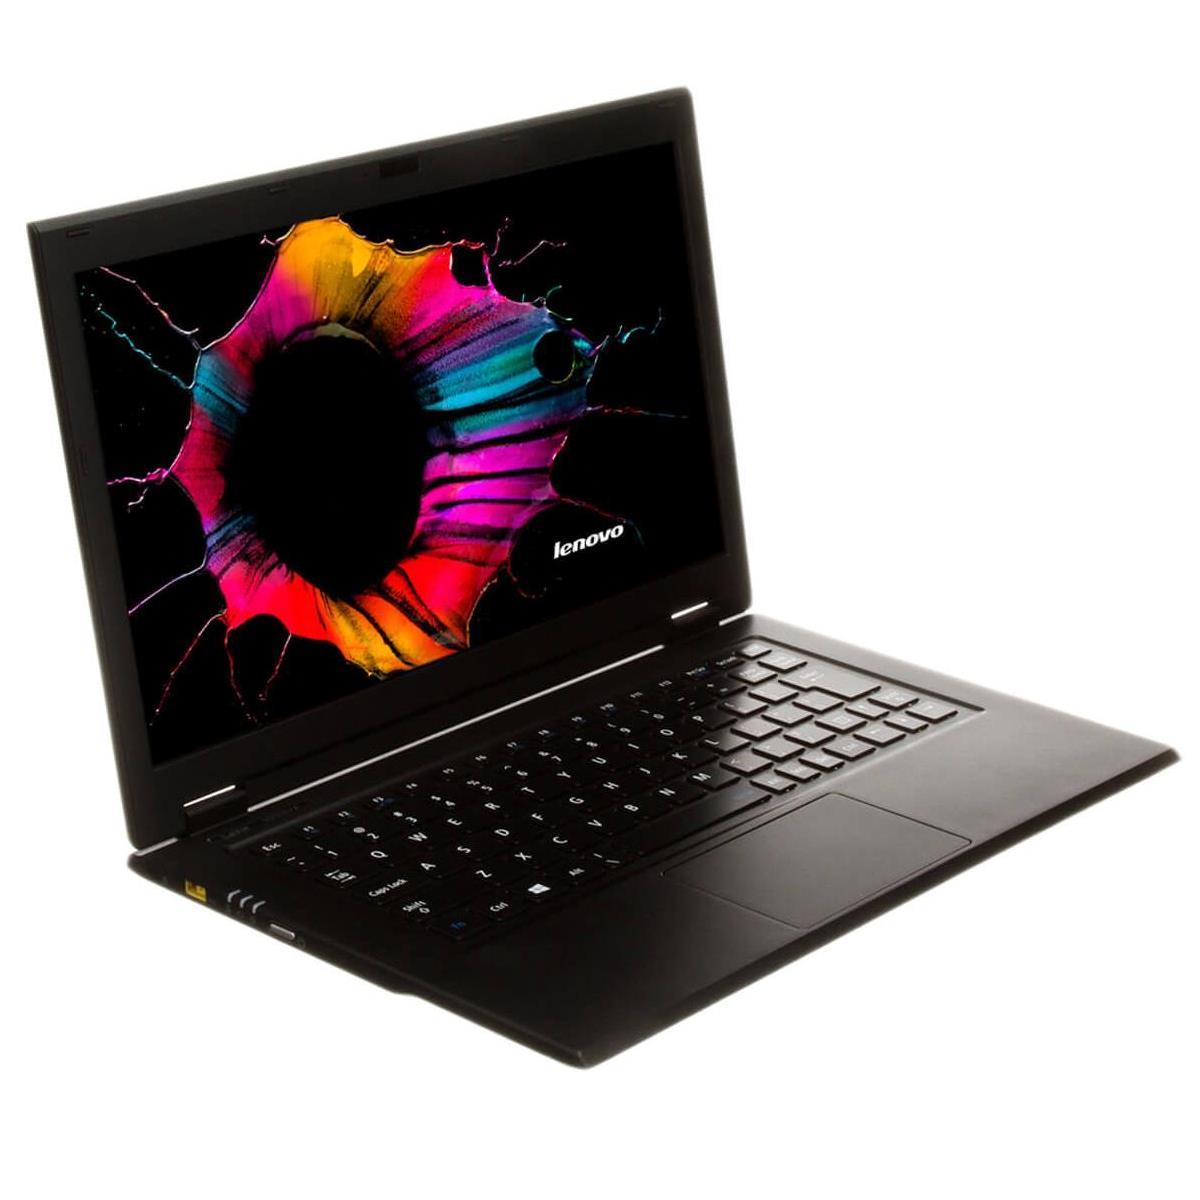 "$800 Lenovo LaVie Z 13.3"" Wide Quad HD Notebook, i7-5500U, 8GB RAM, 256GB SSD, Windows 10, 1.87 lb with Adorama Free shipping."